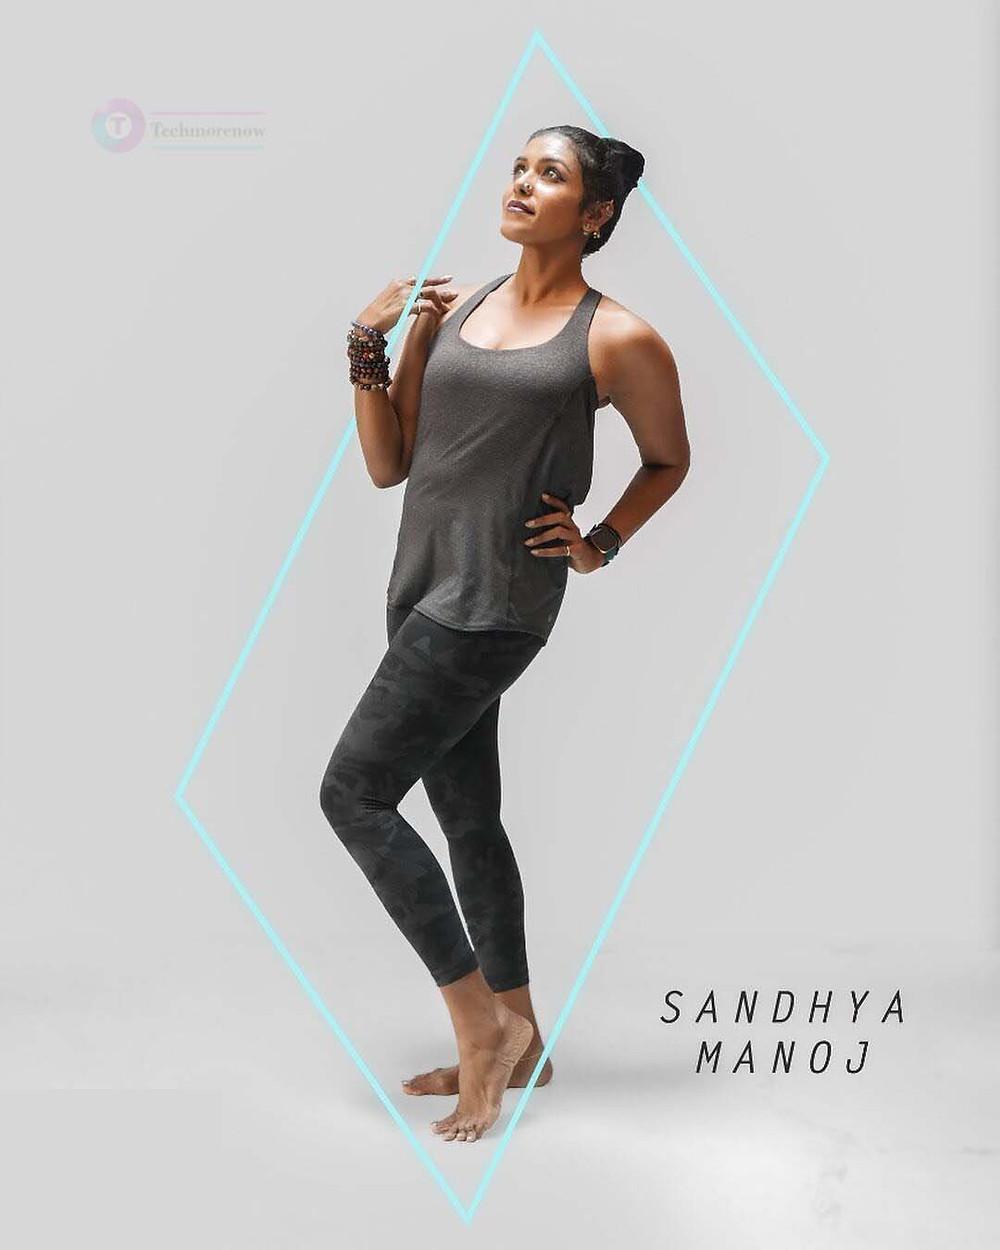 Bigg Boss Sandya Manoj Yoga